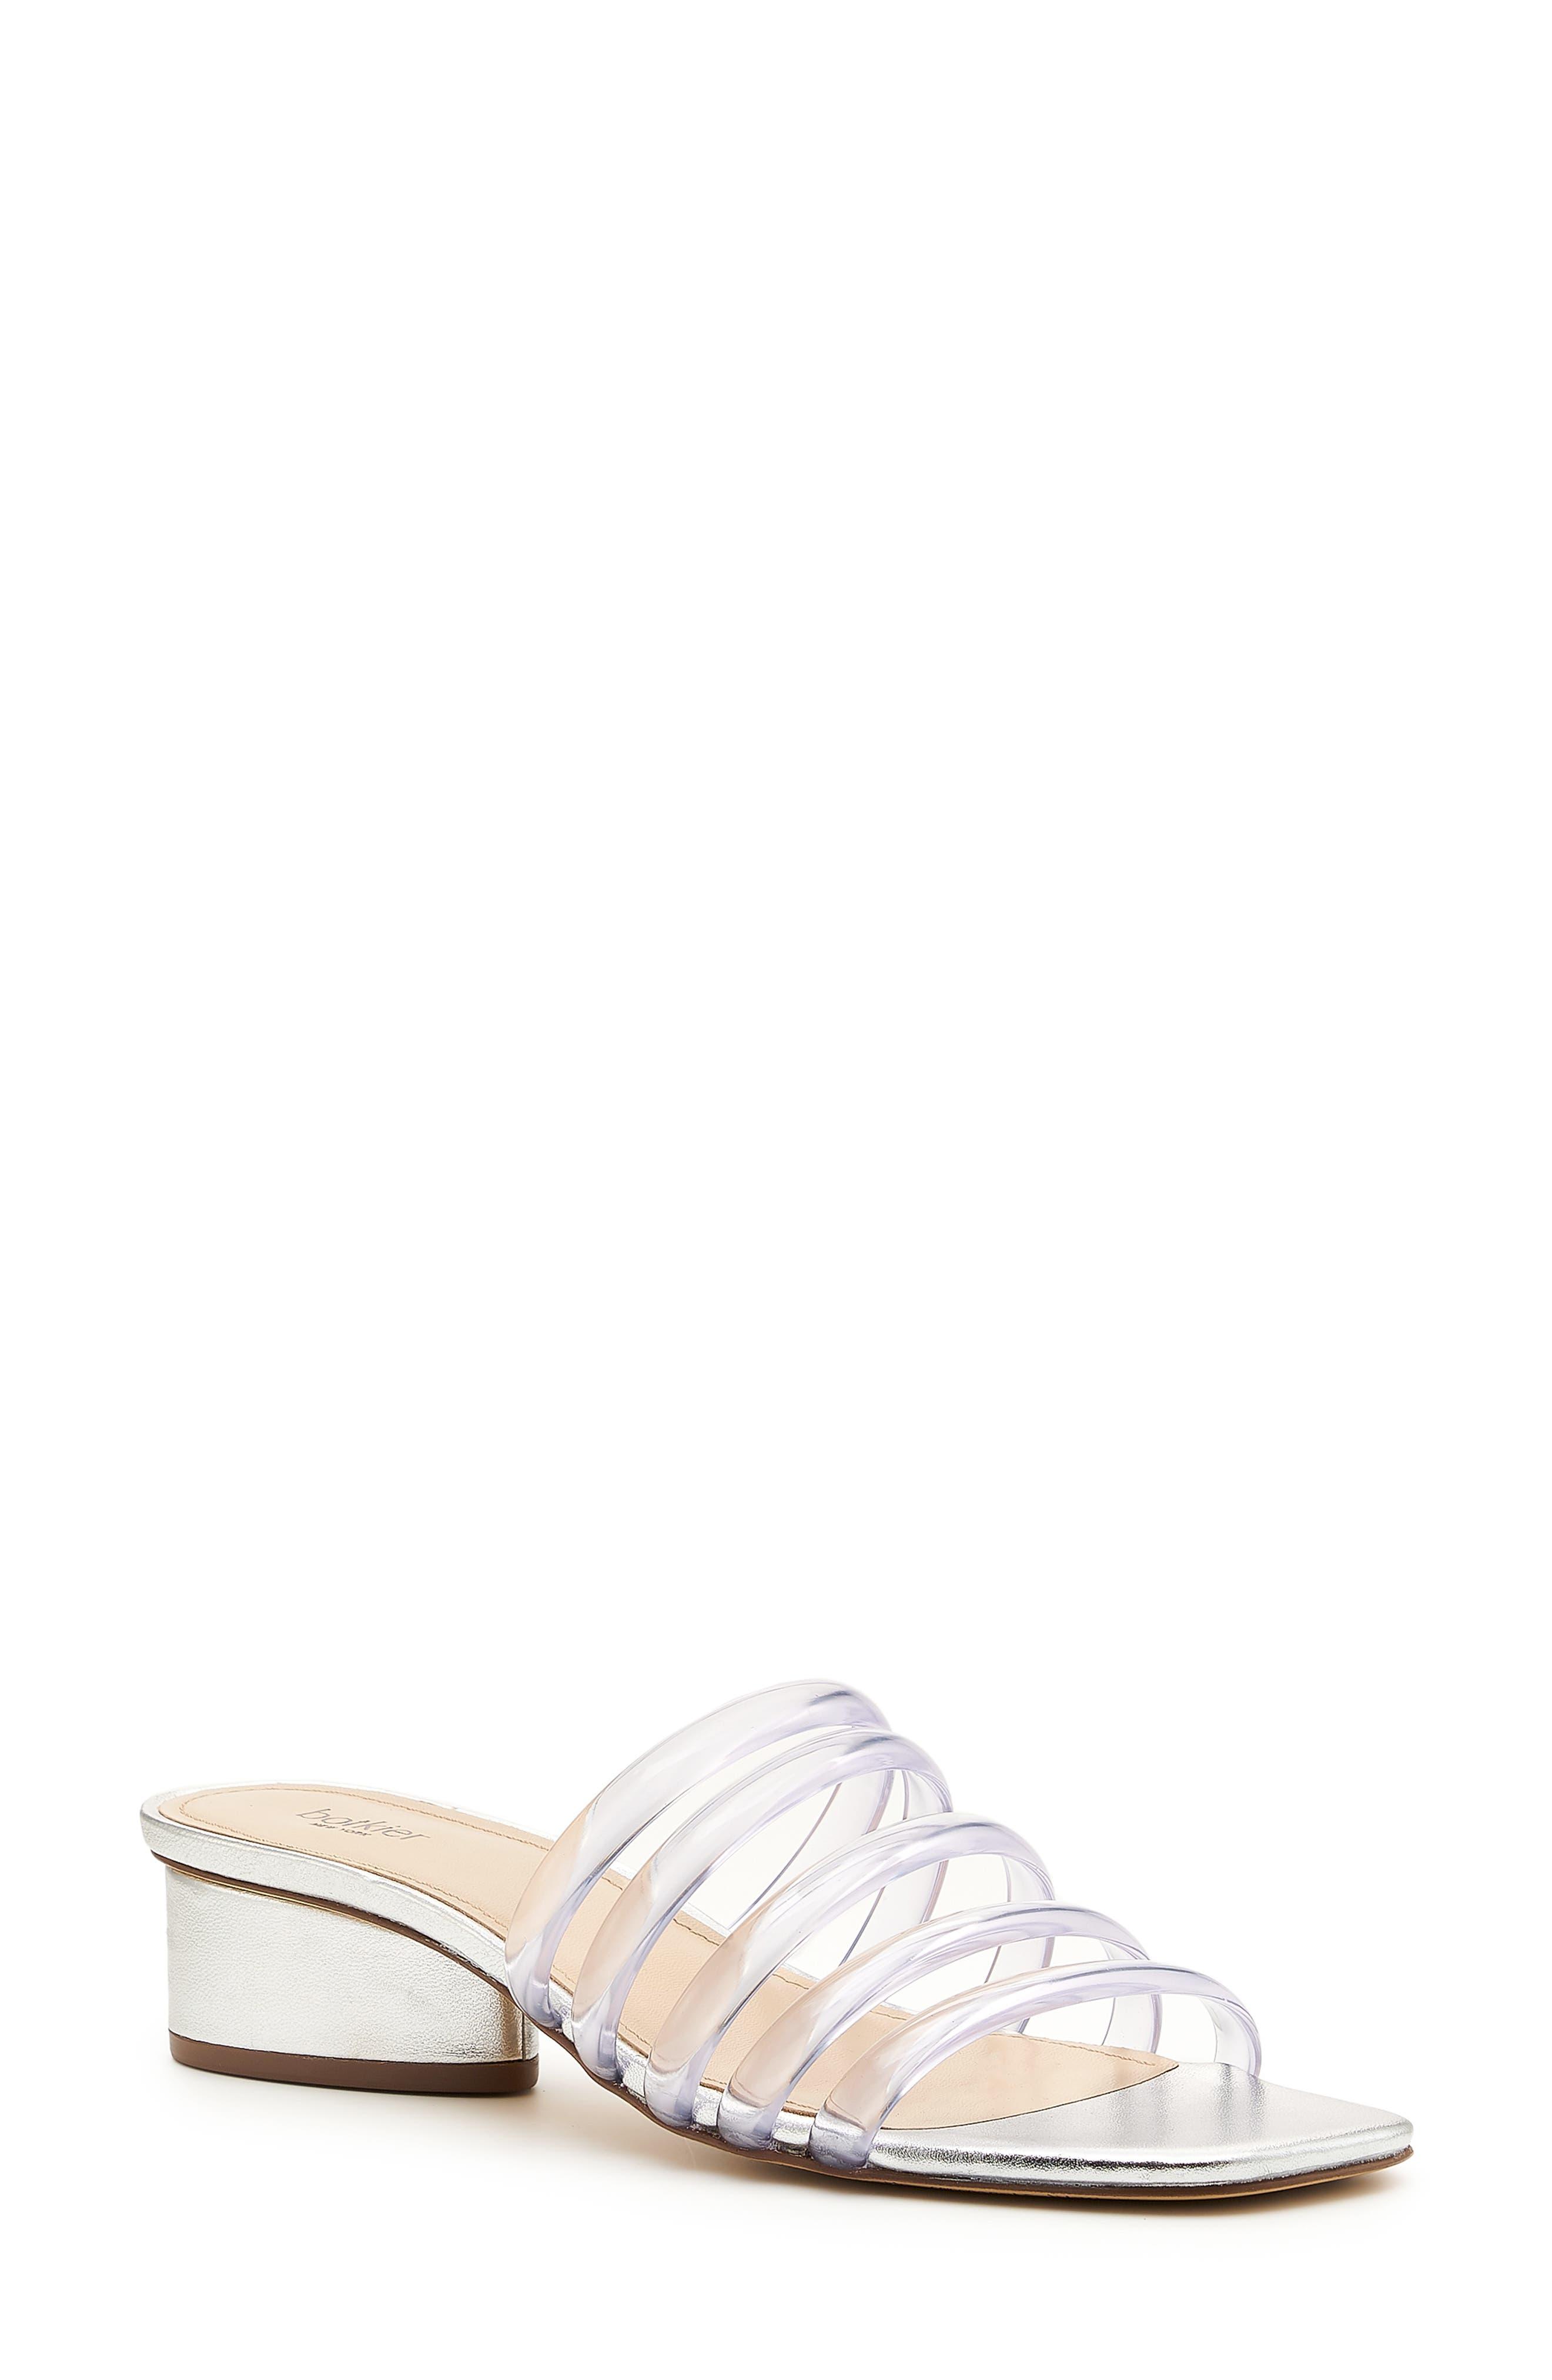 Yani Slide Sandal